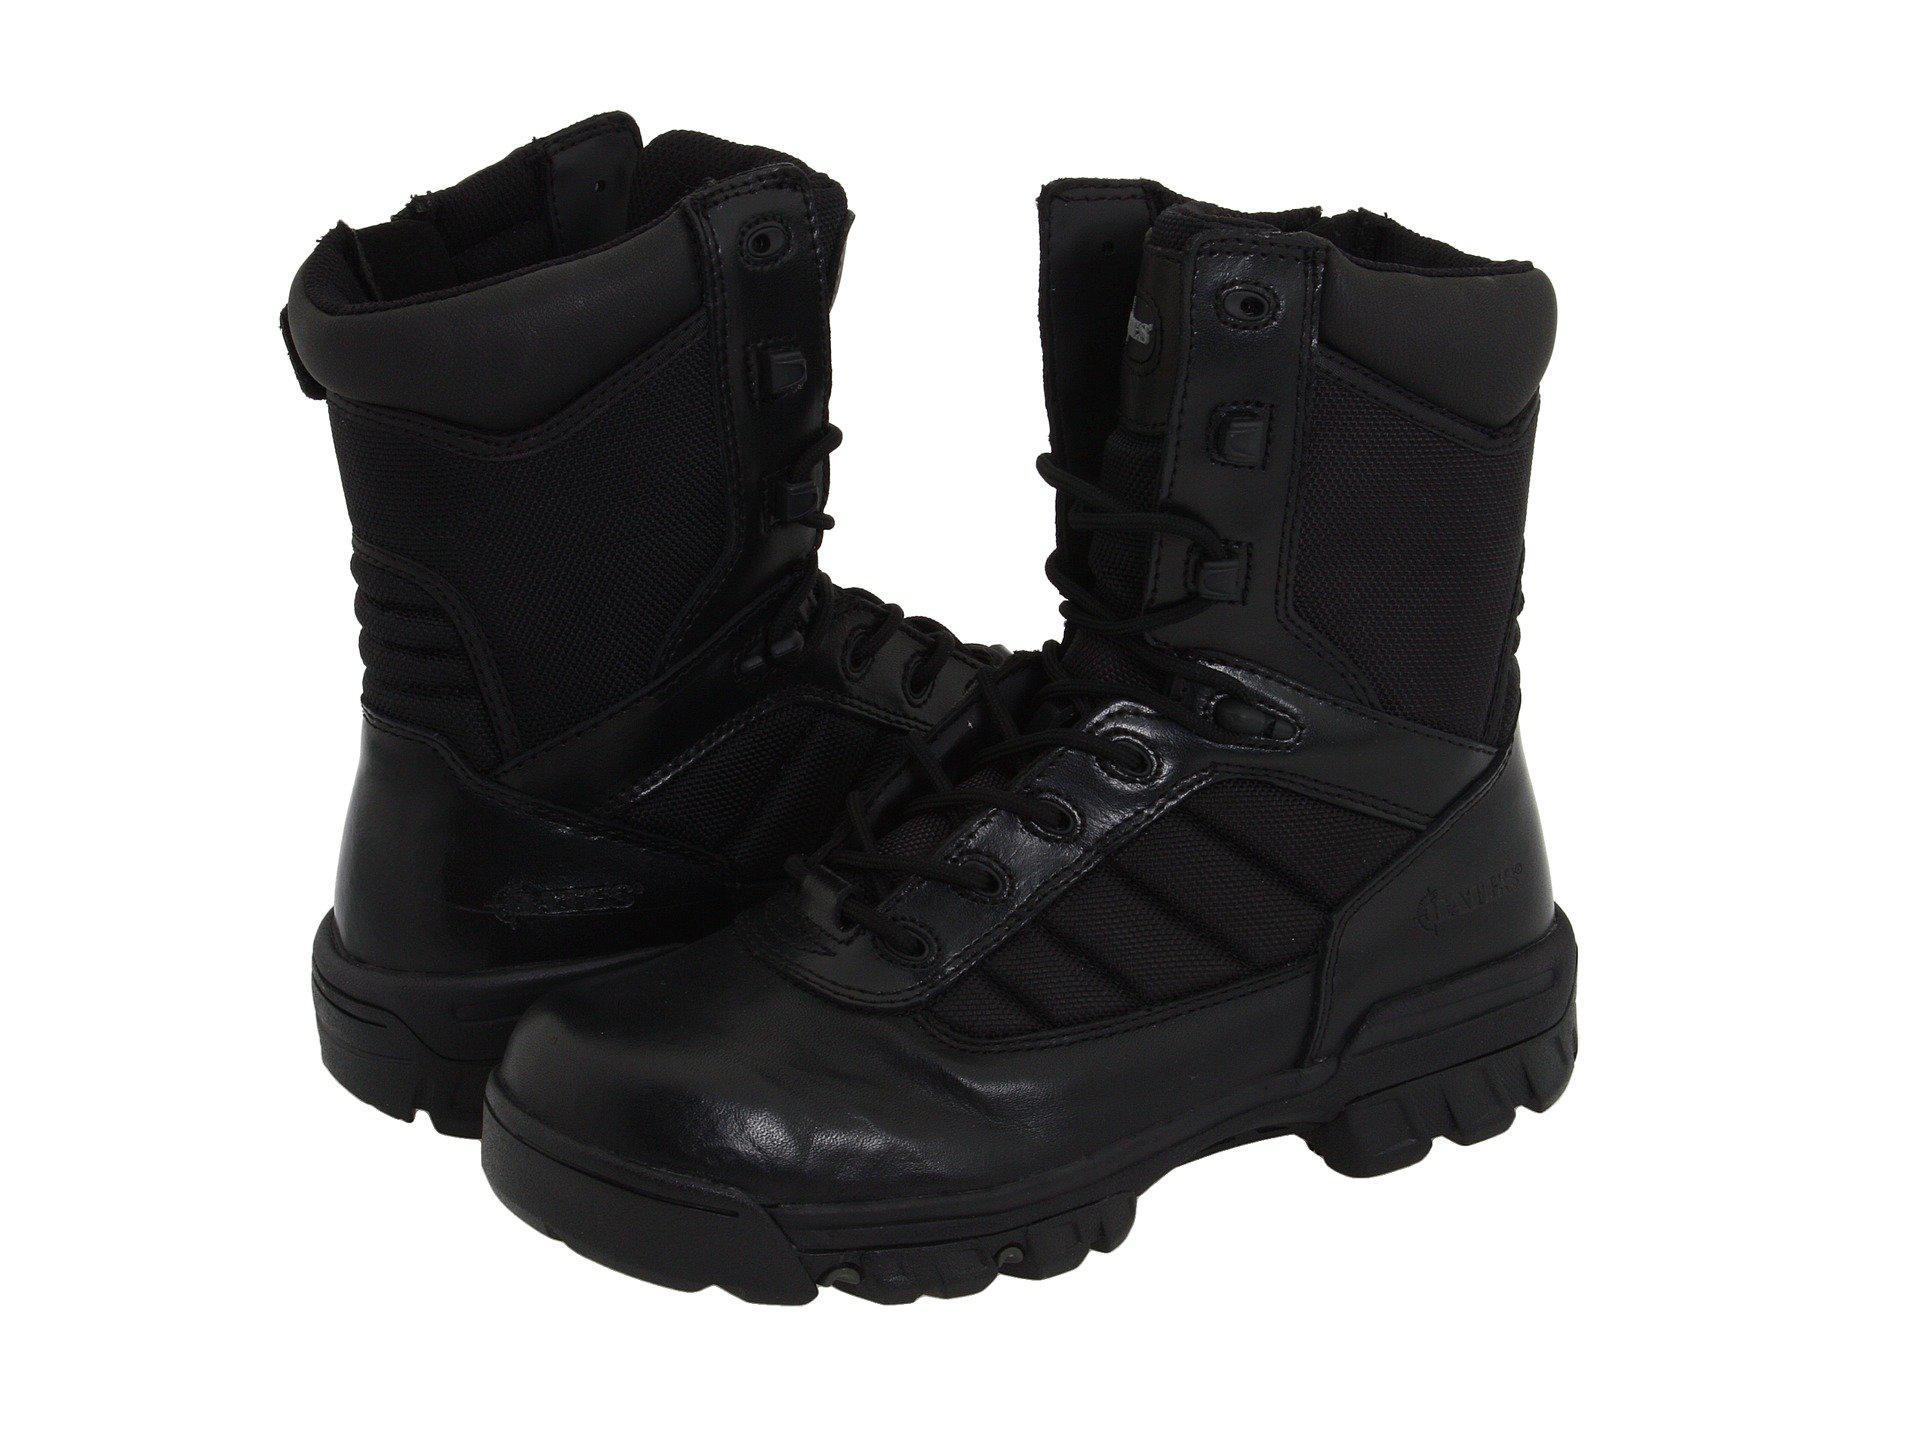 Lyst - Bates Ultra-lites (black Leather) Women s Work Boots in Black 7701e8b13